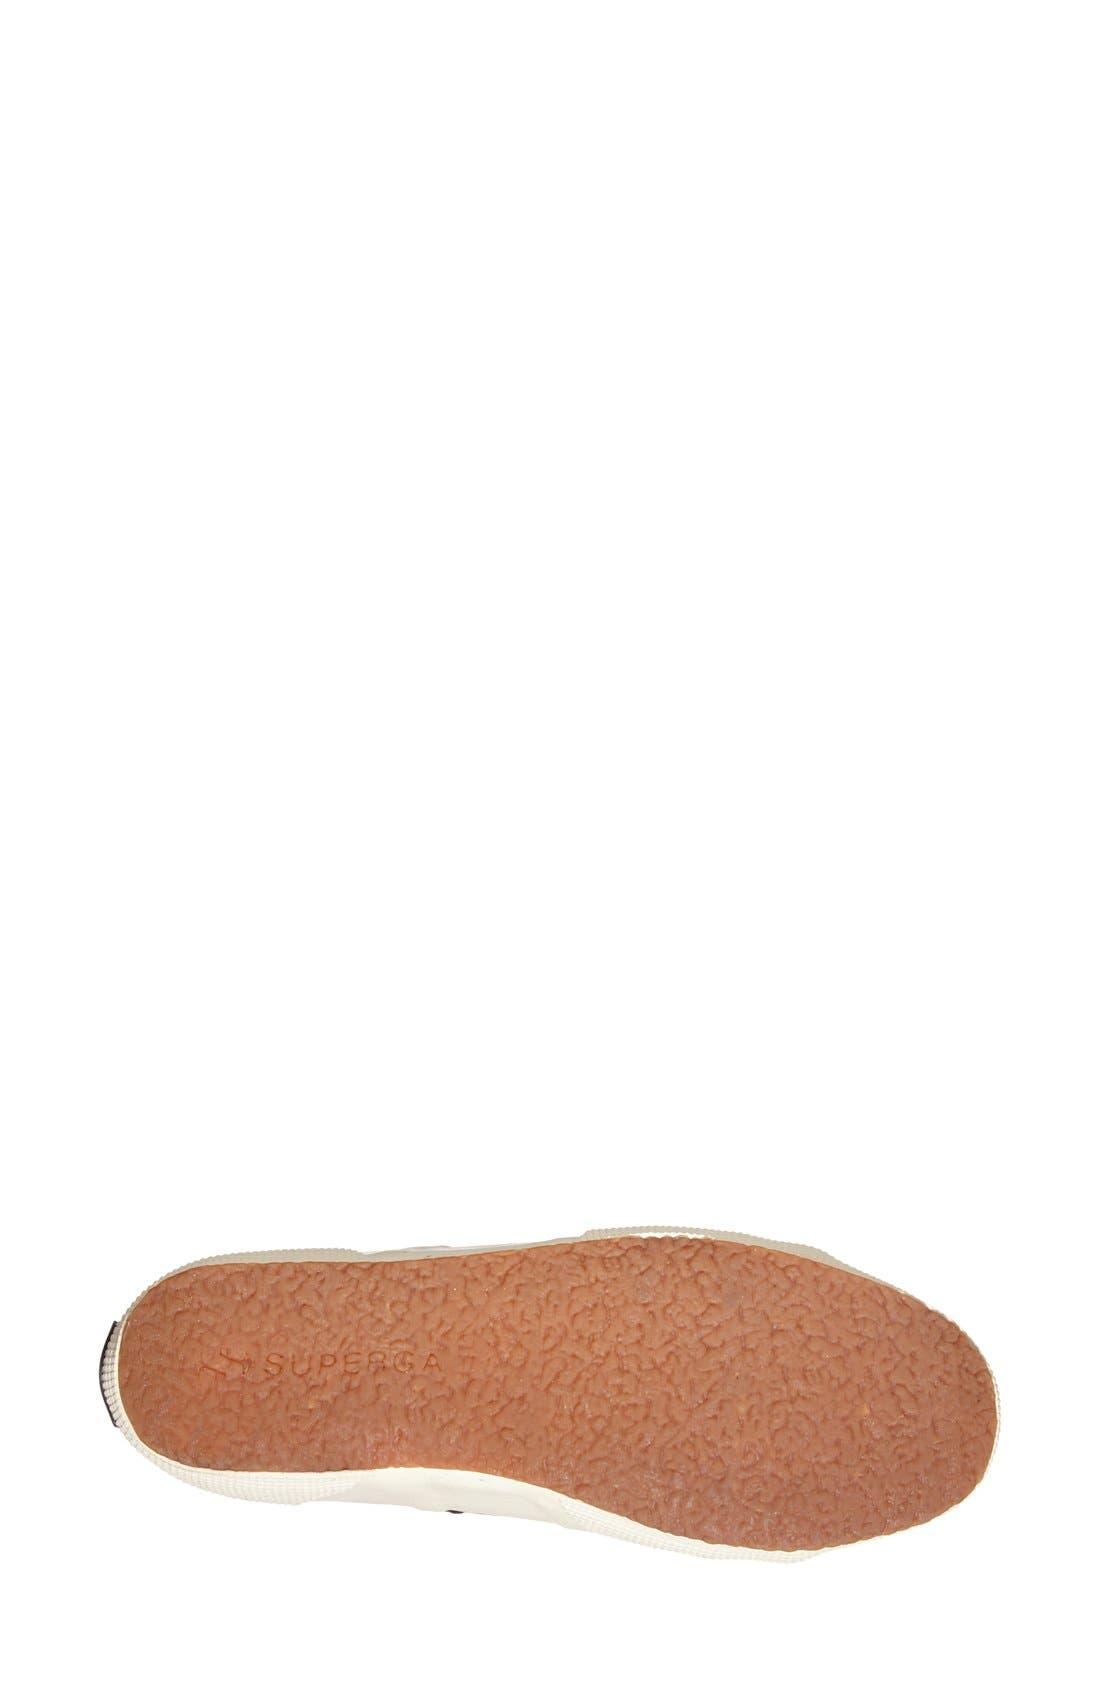 Alternate Image 4  - Superga 'Perforated Cotu' Leather Sneaker (Women)